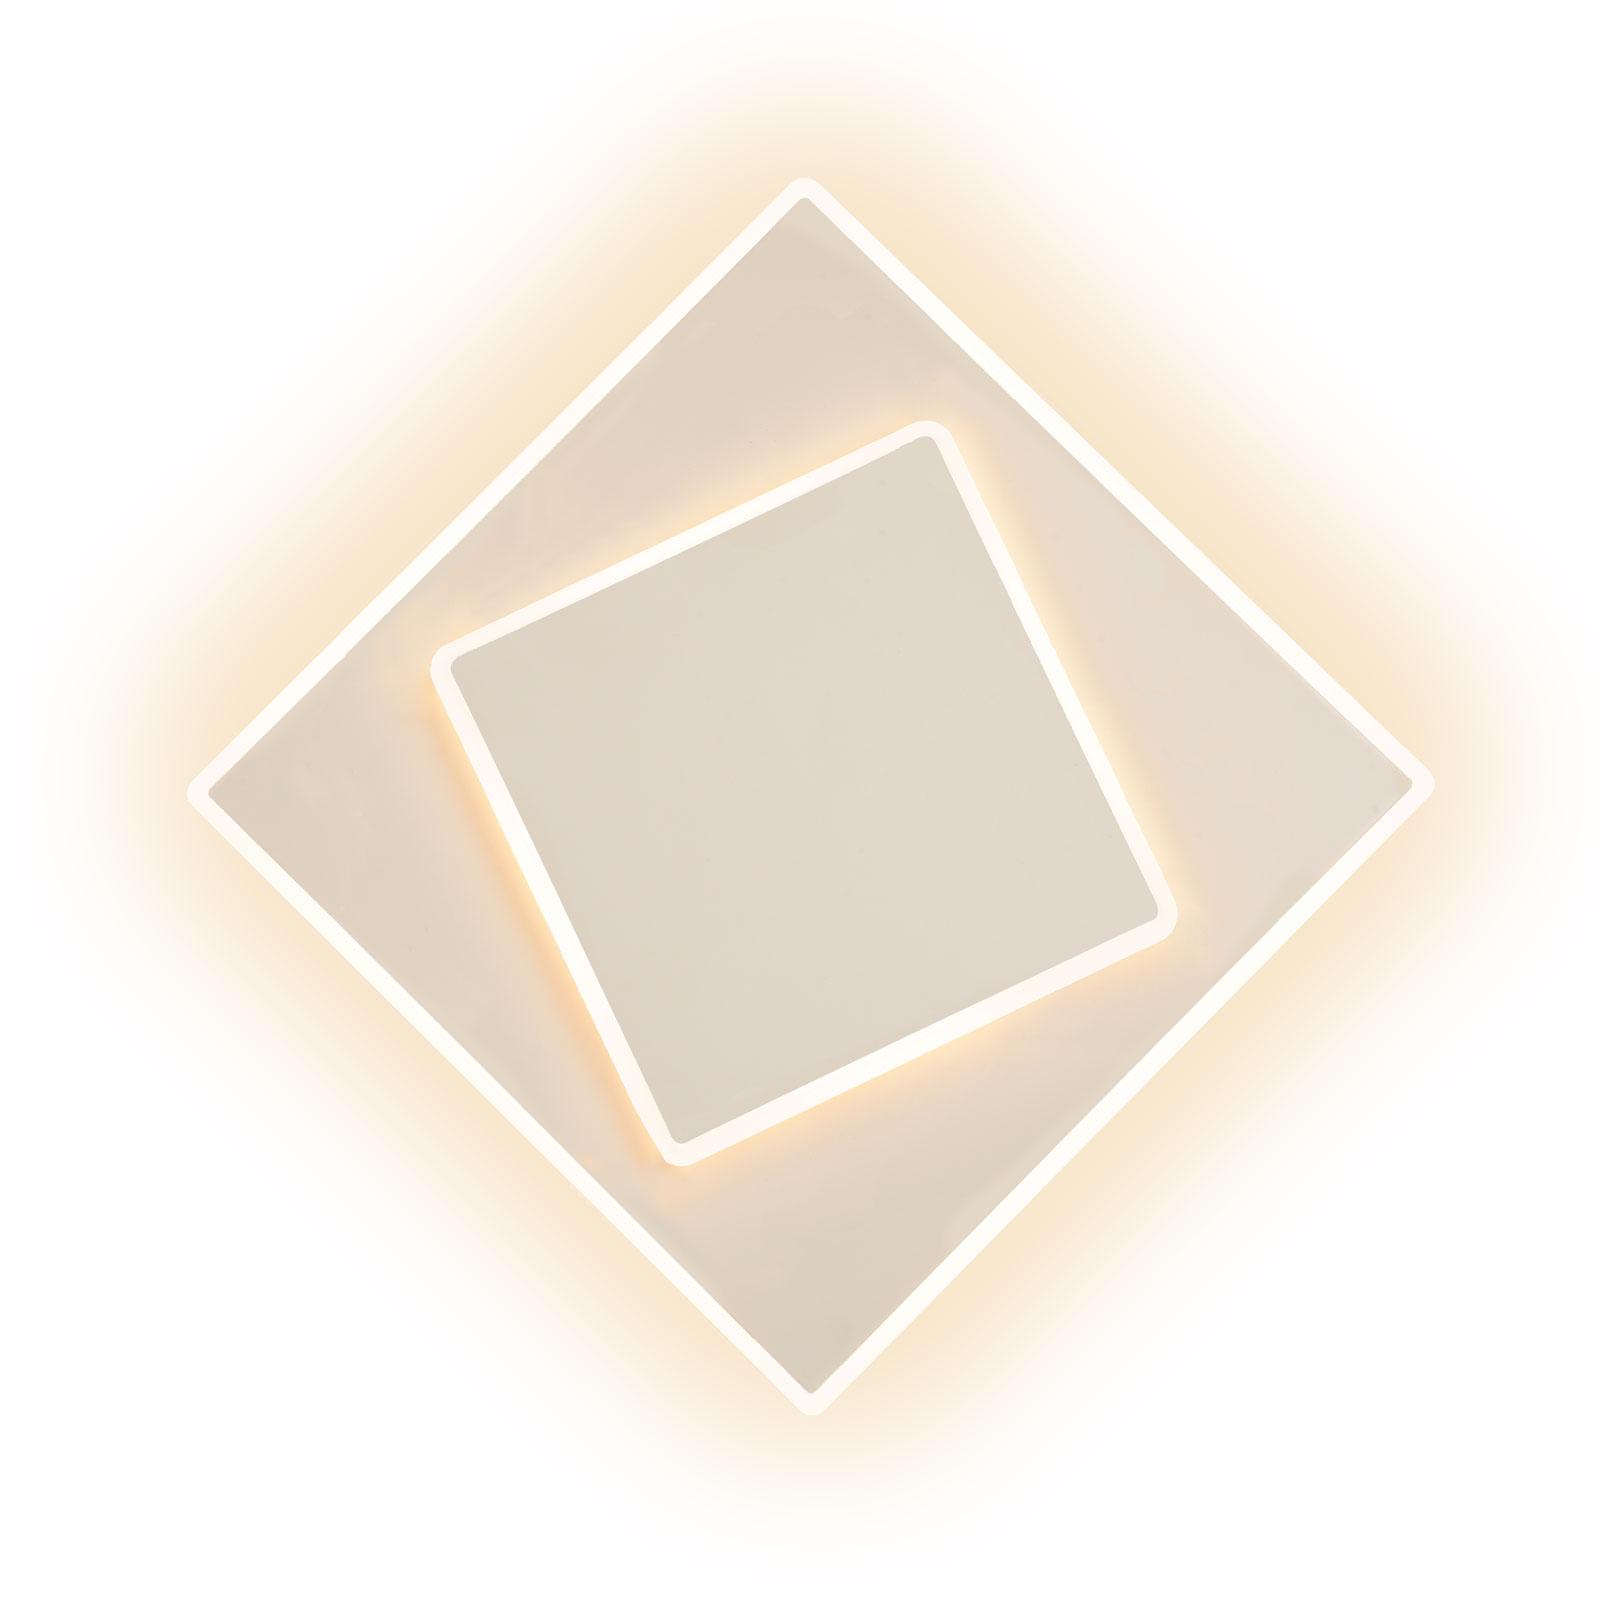 Applique LED Dakla, bianca, 18x18 cm